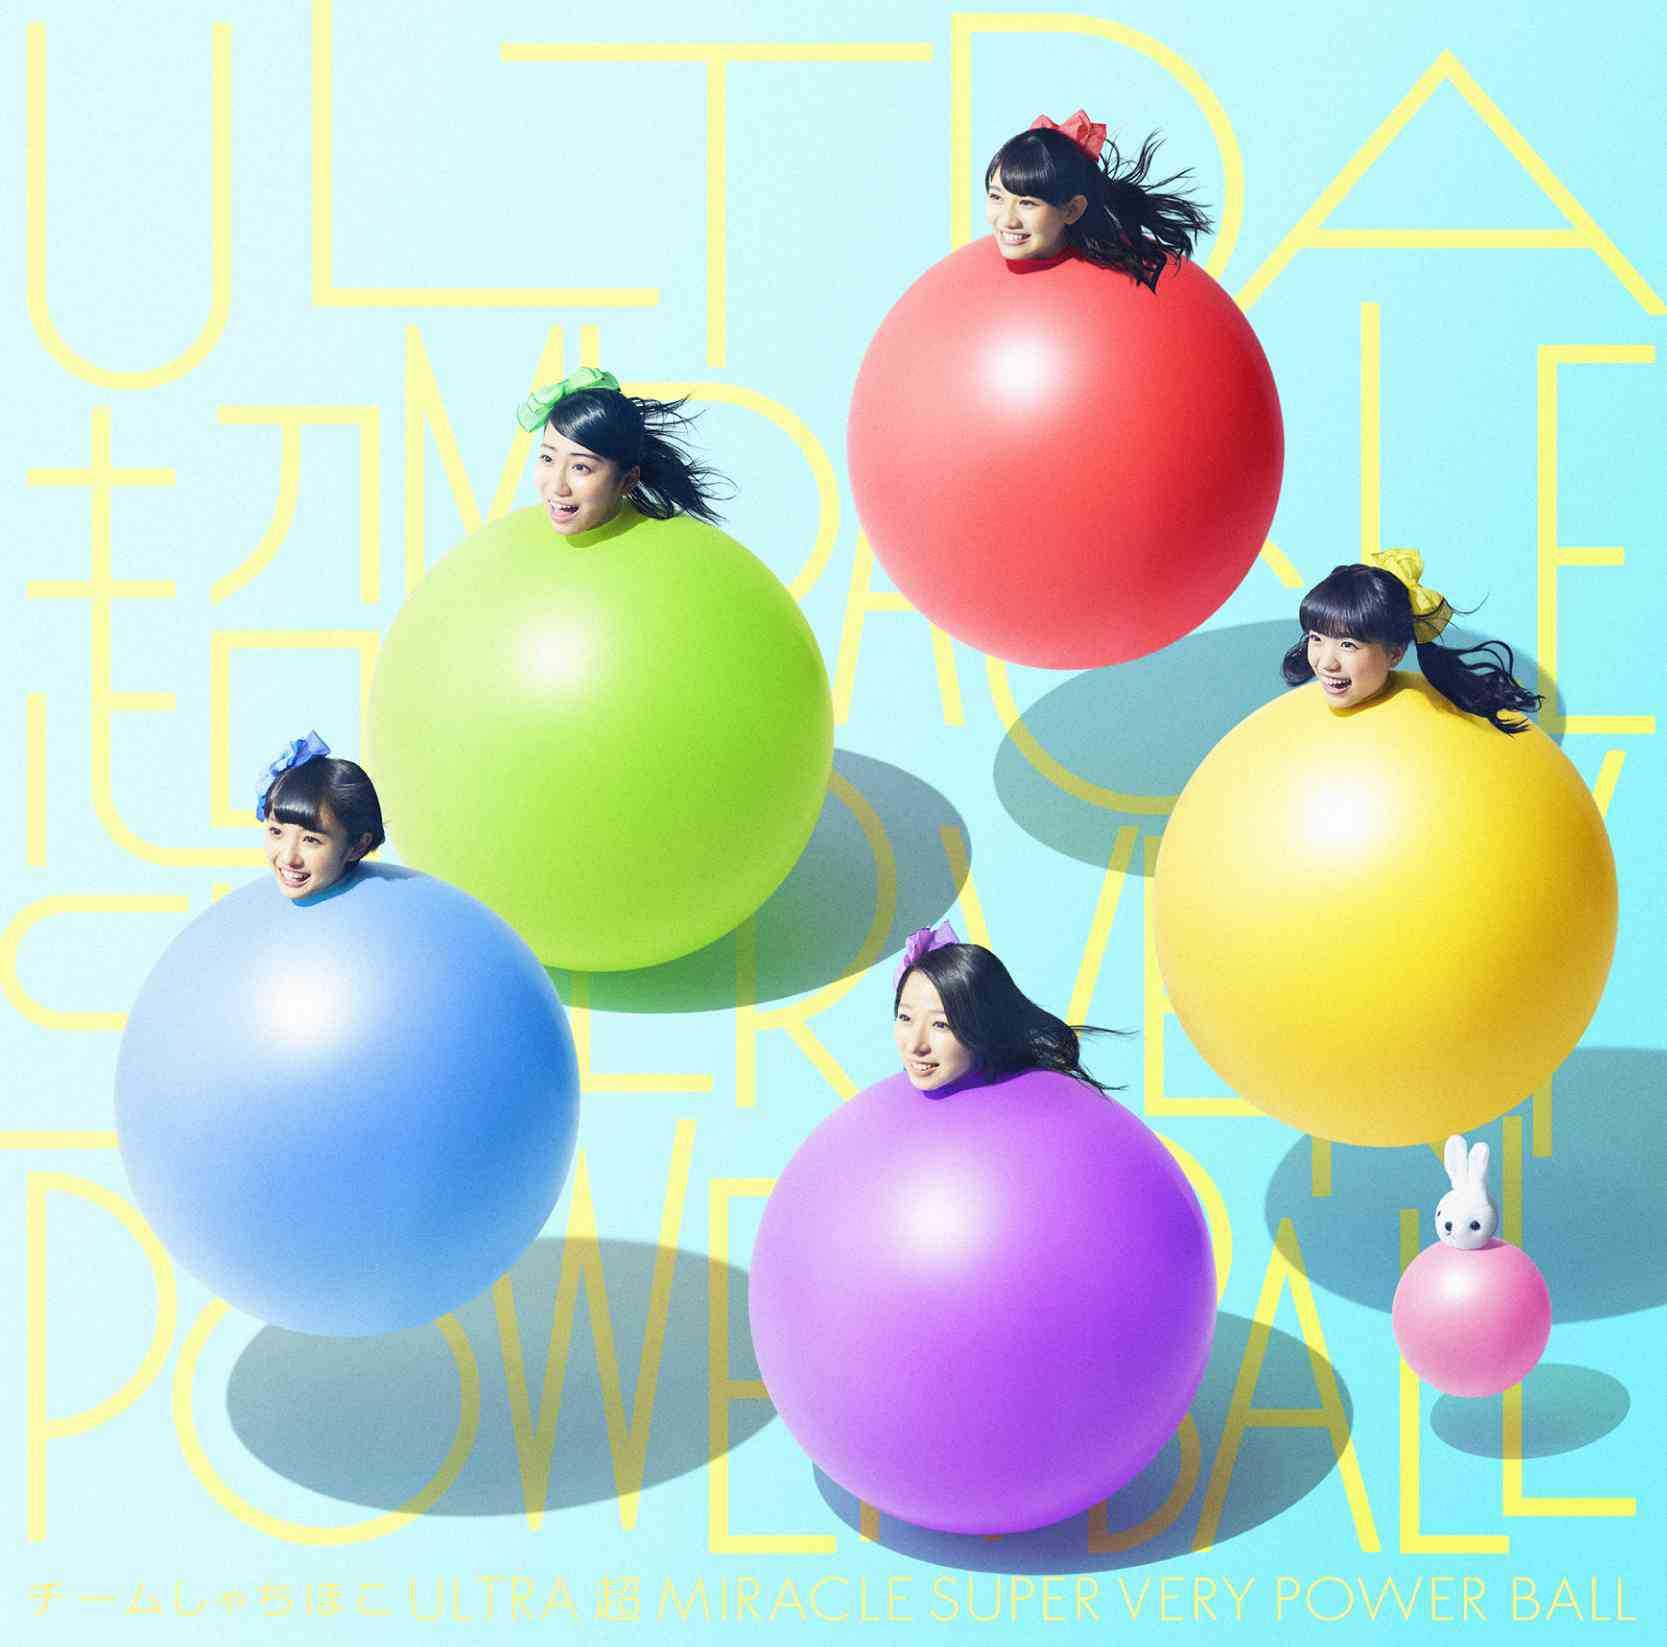 ULTRA 超 MIRACLE SUPER VERY POWER BALLのメイン画像